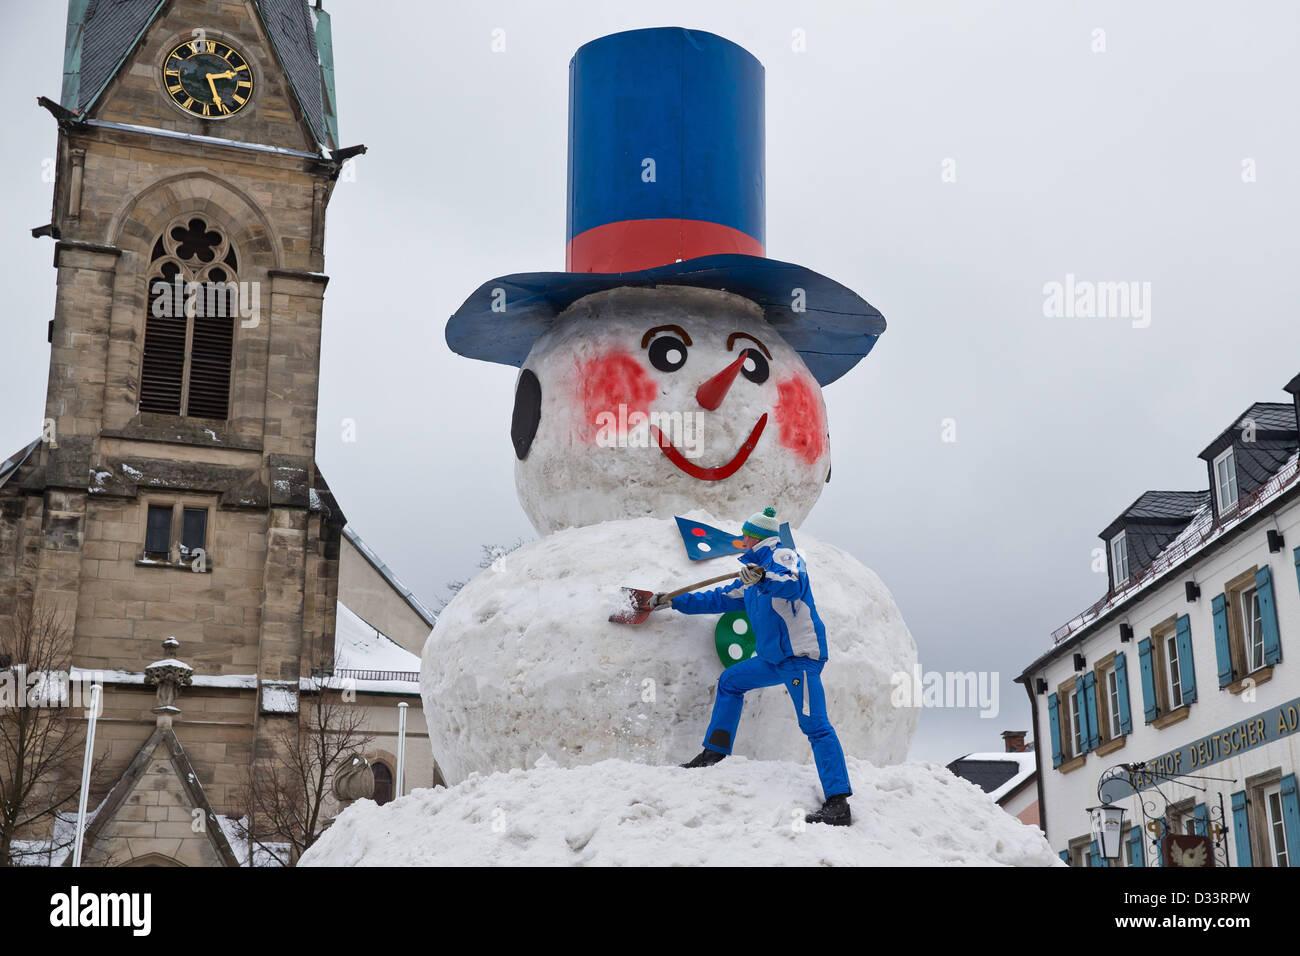 Bischofsgruen, Germany. 8th February 2013. Berndt Heidenreich works on 'Jacob', Germany's biggest snowman, - Stock Image